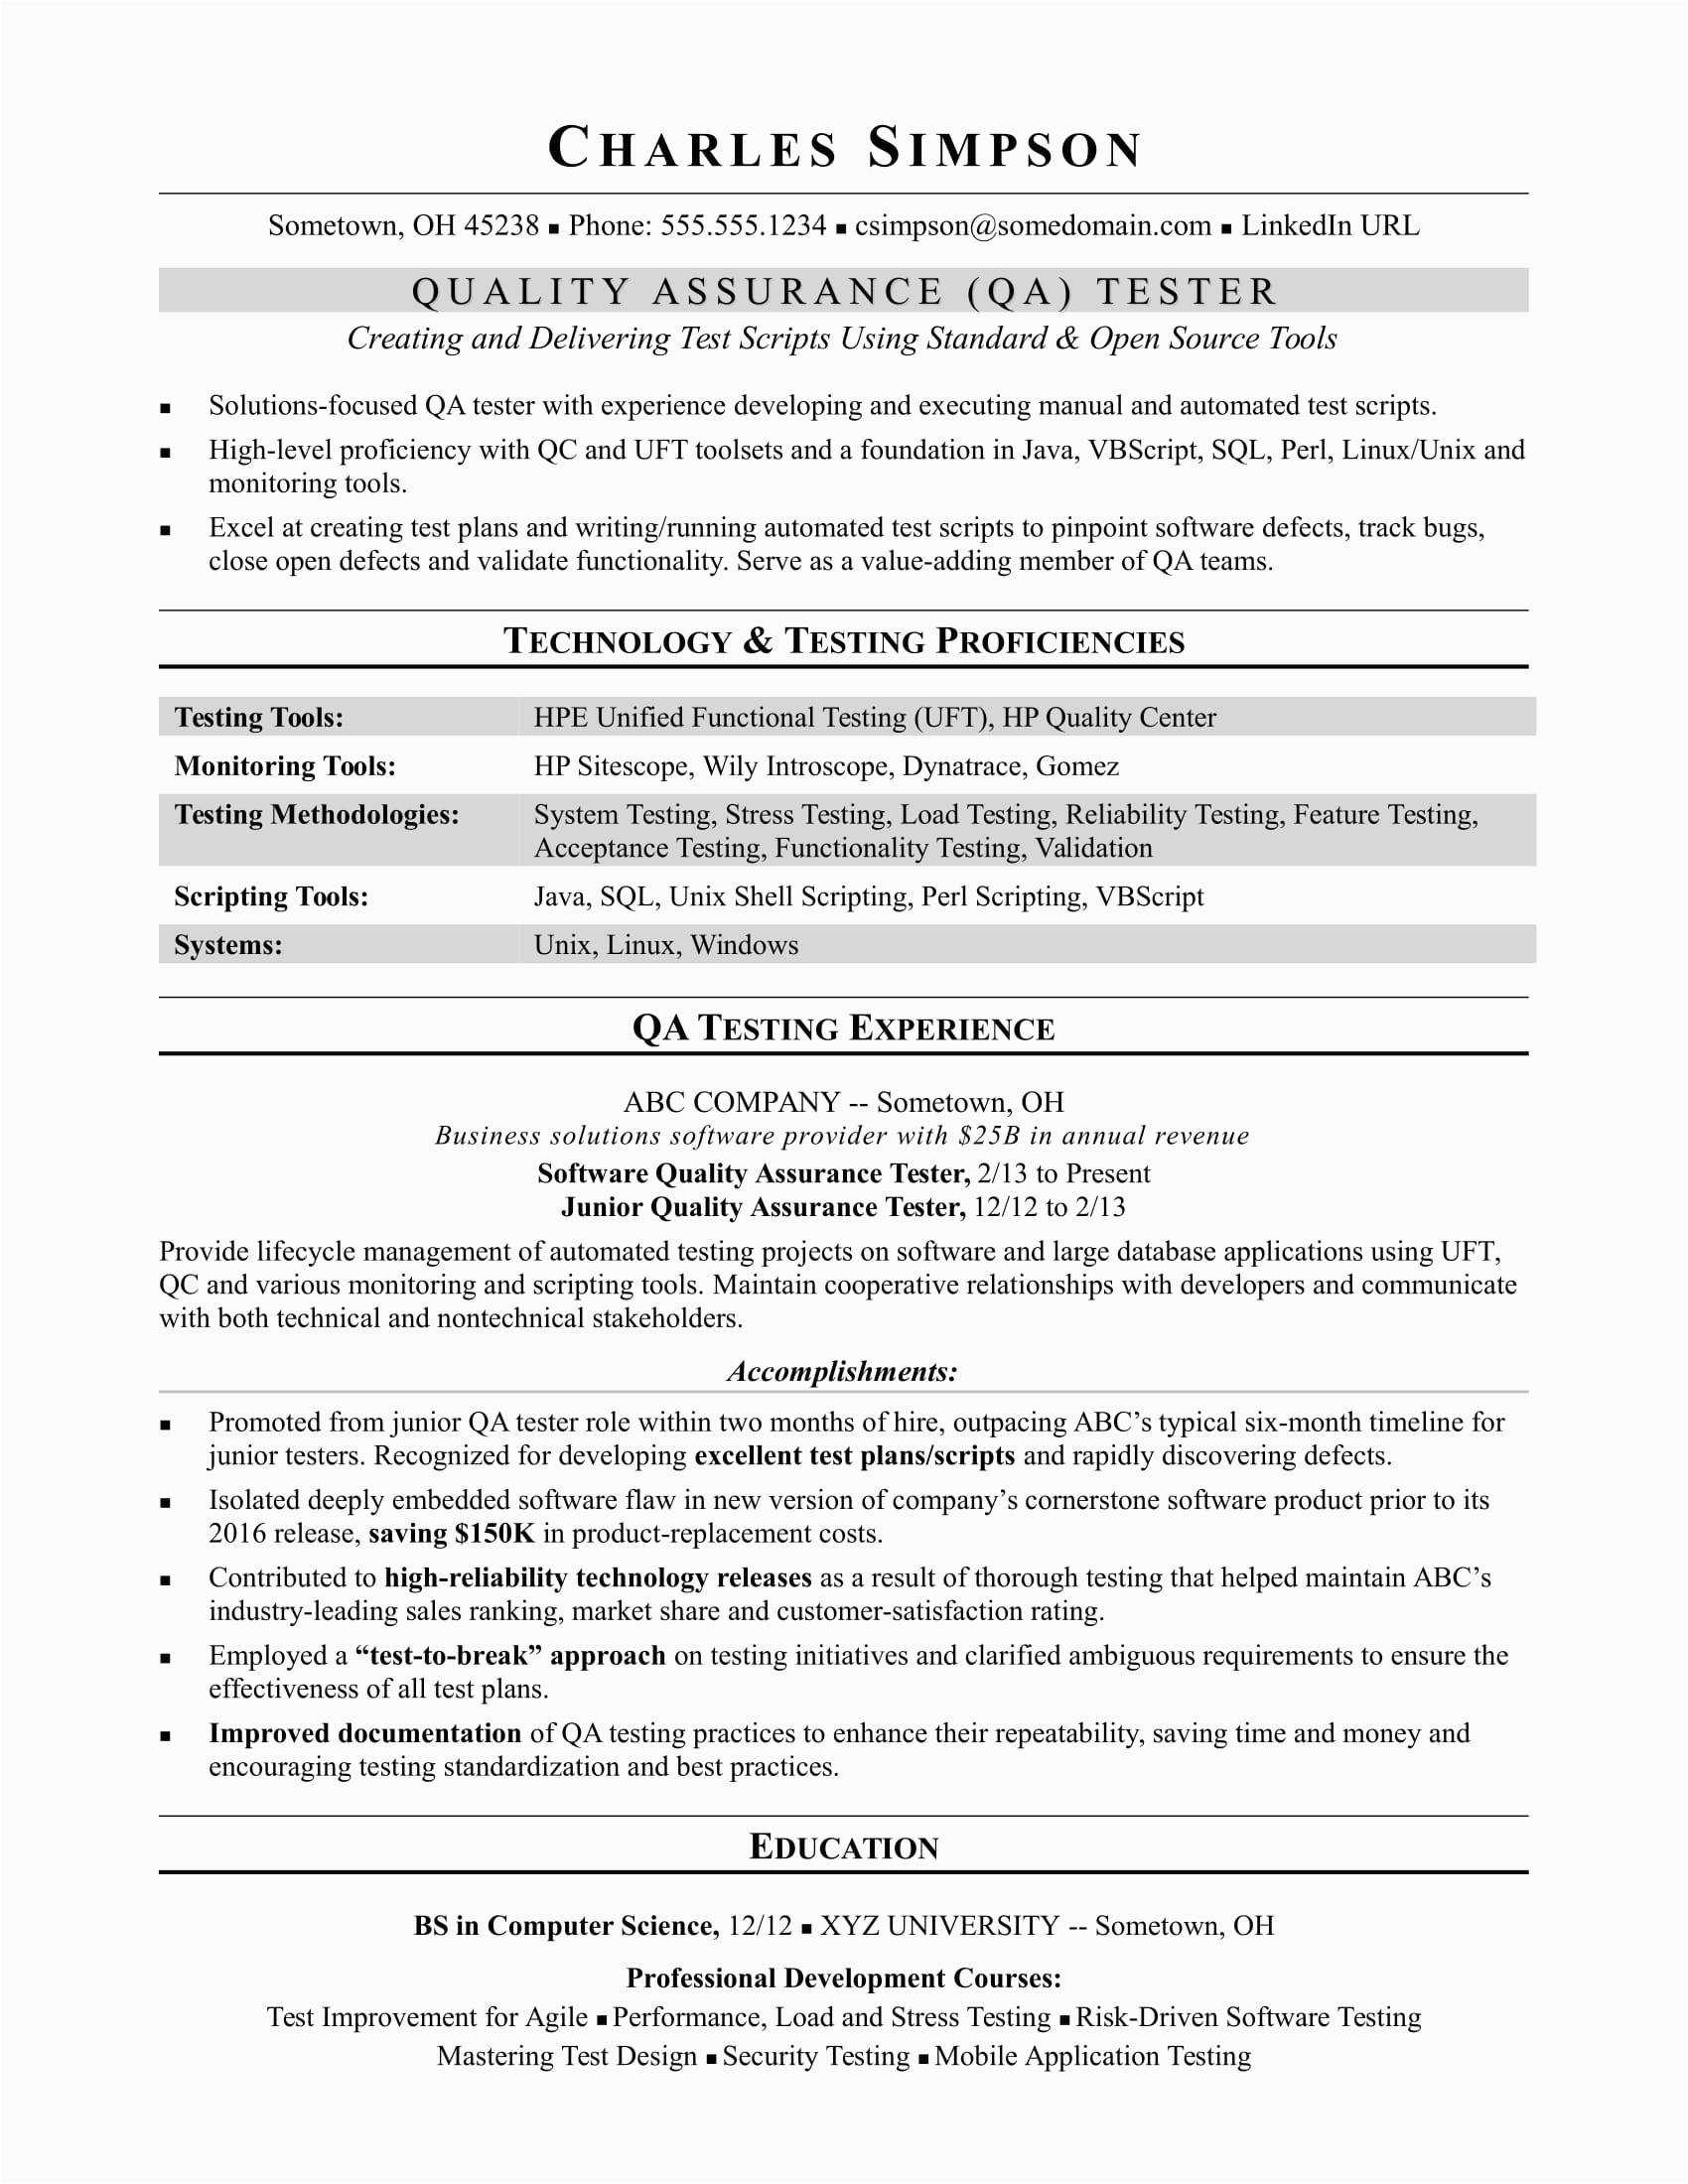 sample resume QA software tester midlevel